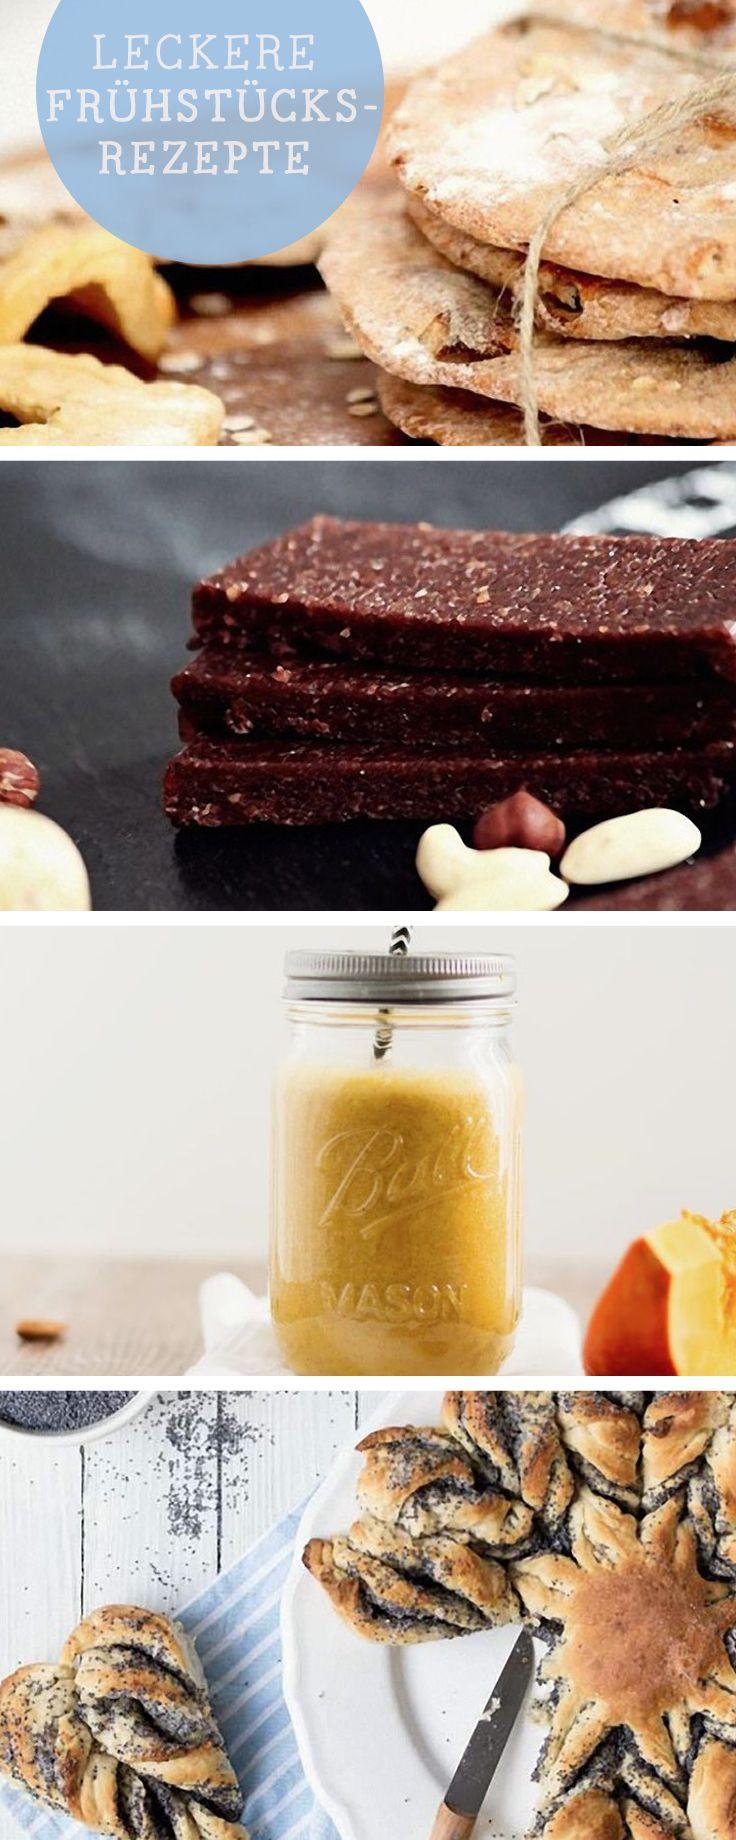 22 best desayunos images on pinterest breakfast health and hilarious frhstcksrezepte auf dawanda die do it yourself anleitung solutioingenieria Image collections